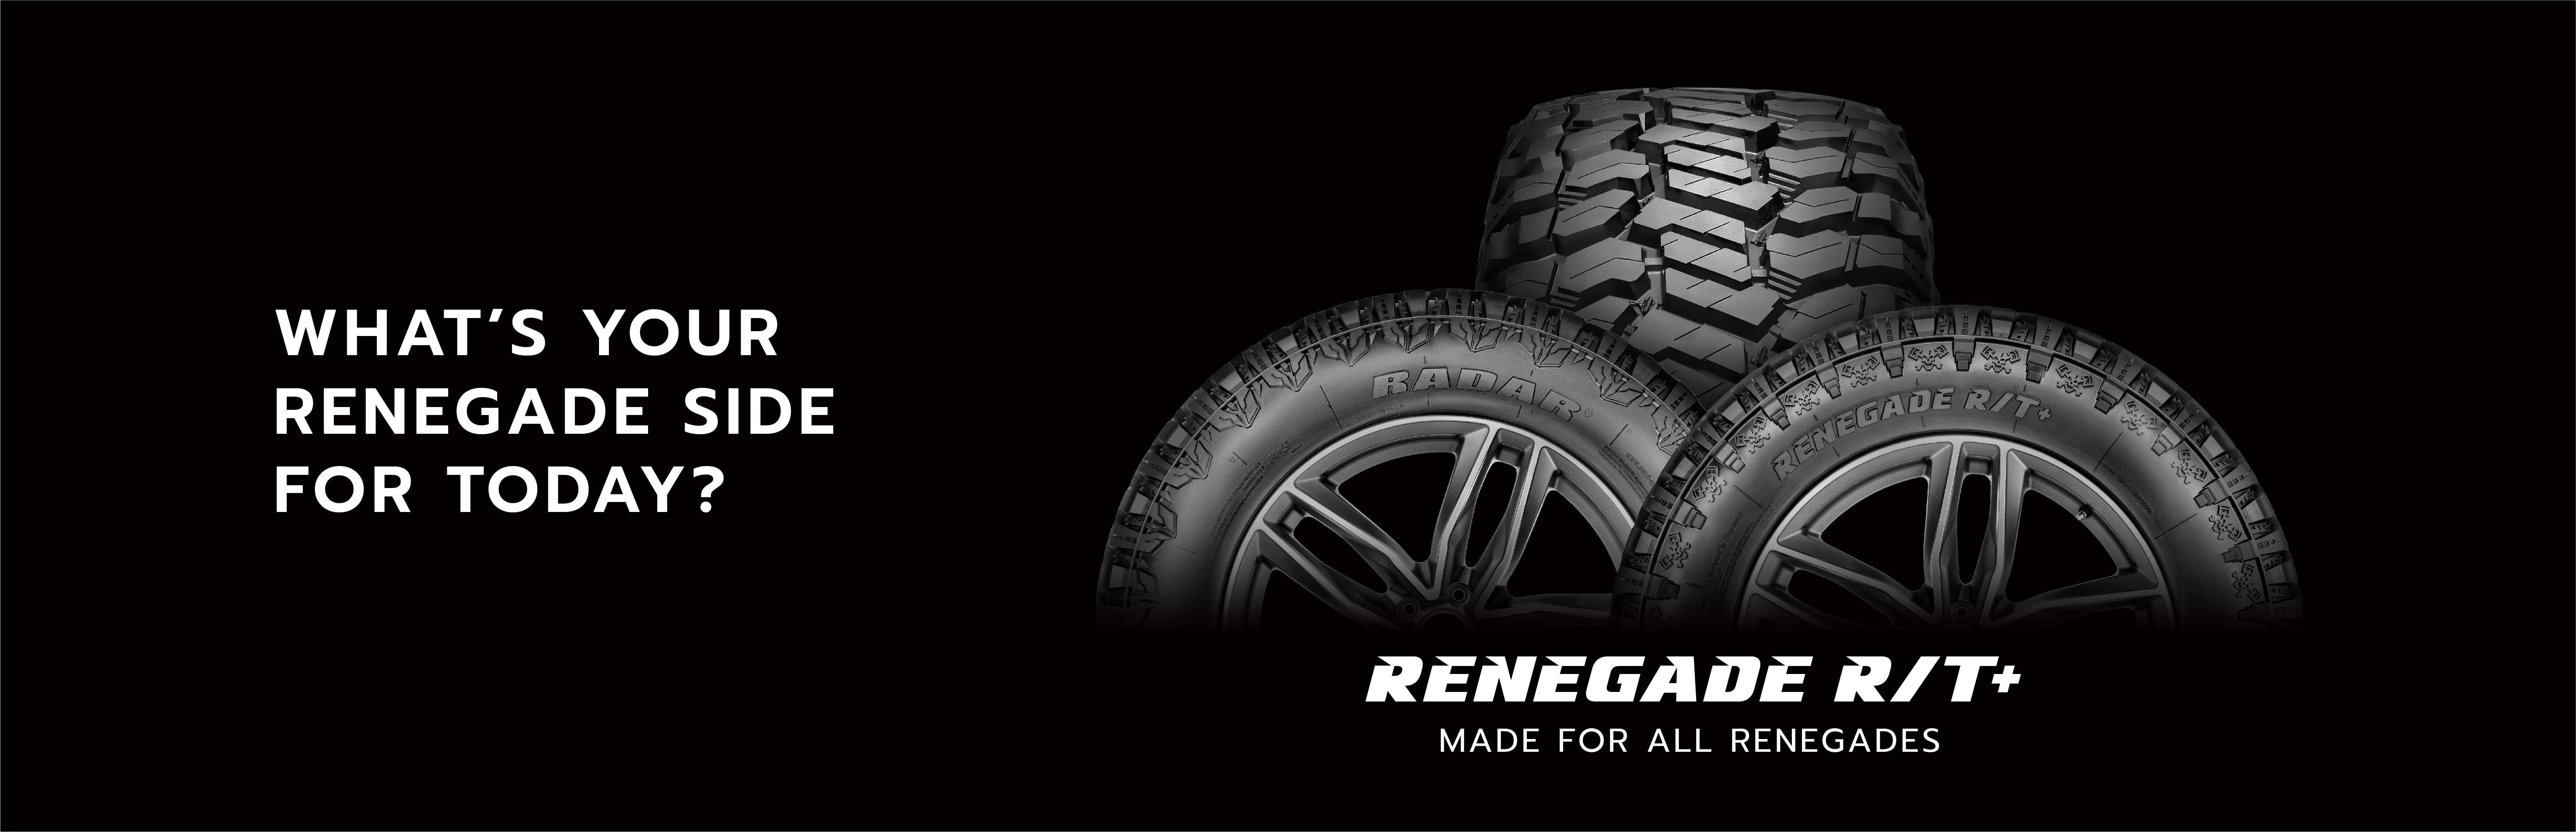 The all-new Rugged Terrain tire range - Renegade RT+